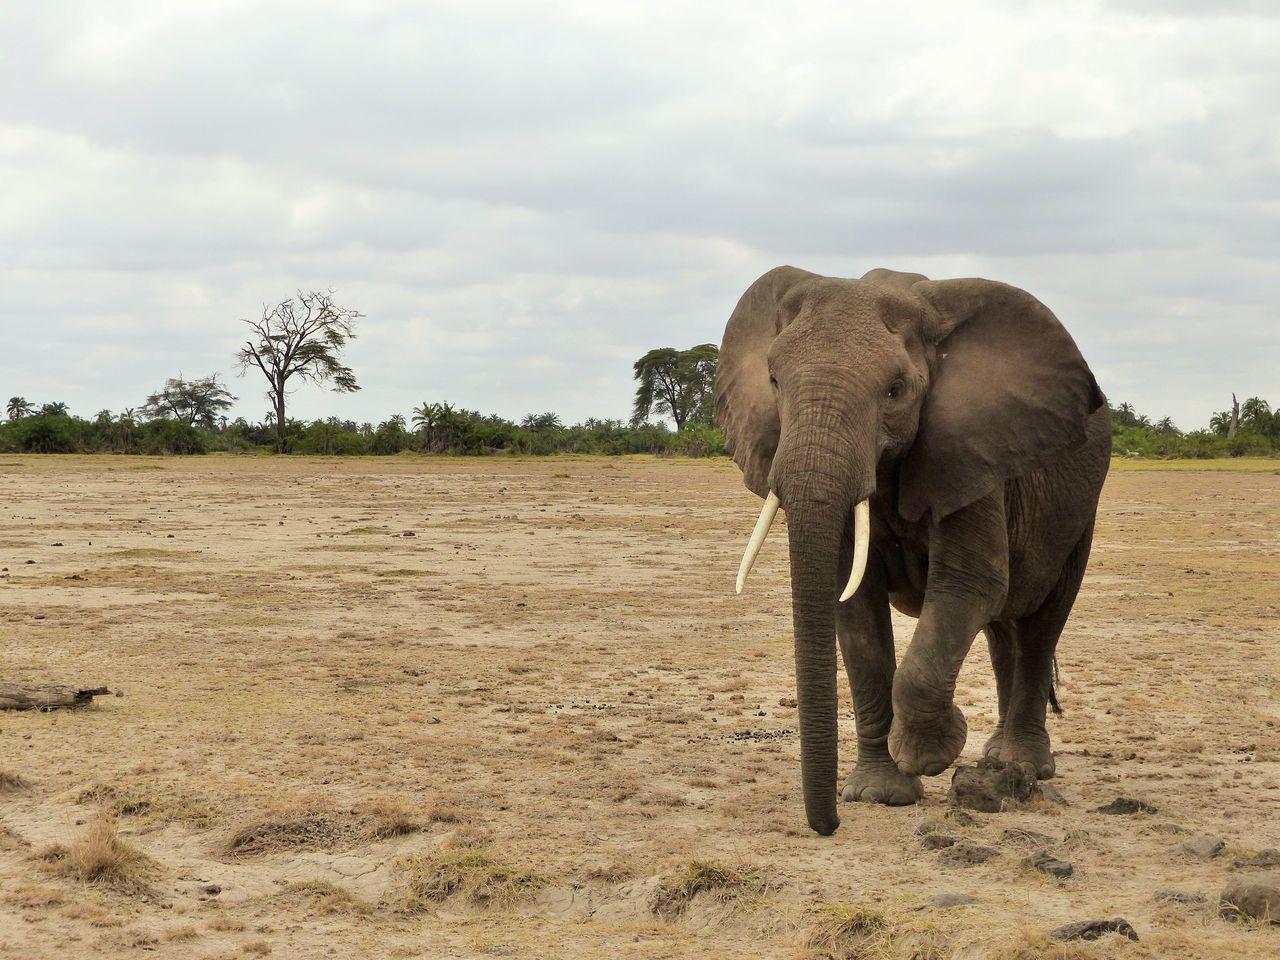 African Elephant Animal Themes Animals In The Wild Elephant Landscape Mammal Nature One Animal Outdoors Safari Animals Tusk